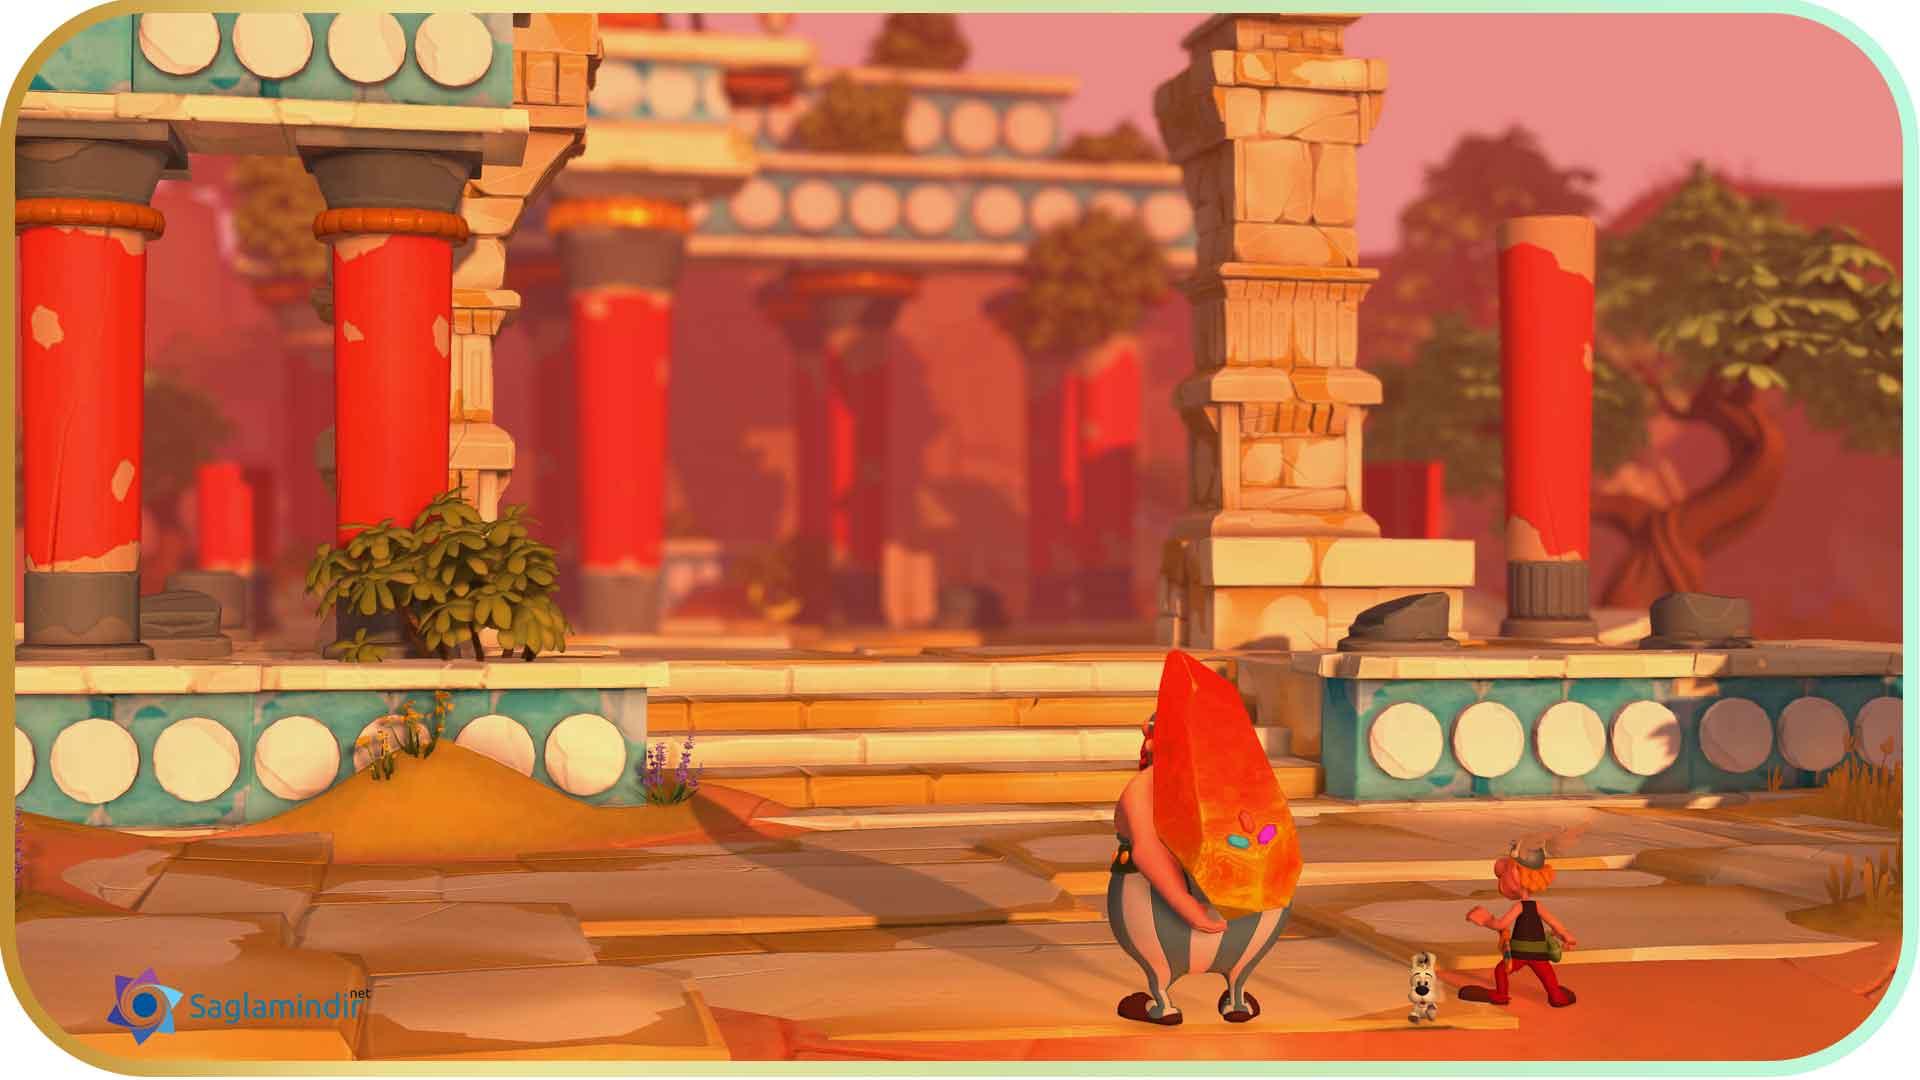 Asterix & Obelix XXL 3 The Crystal Menhir full indir